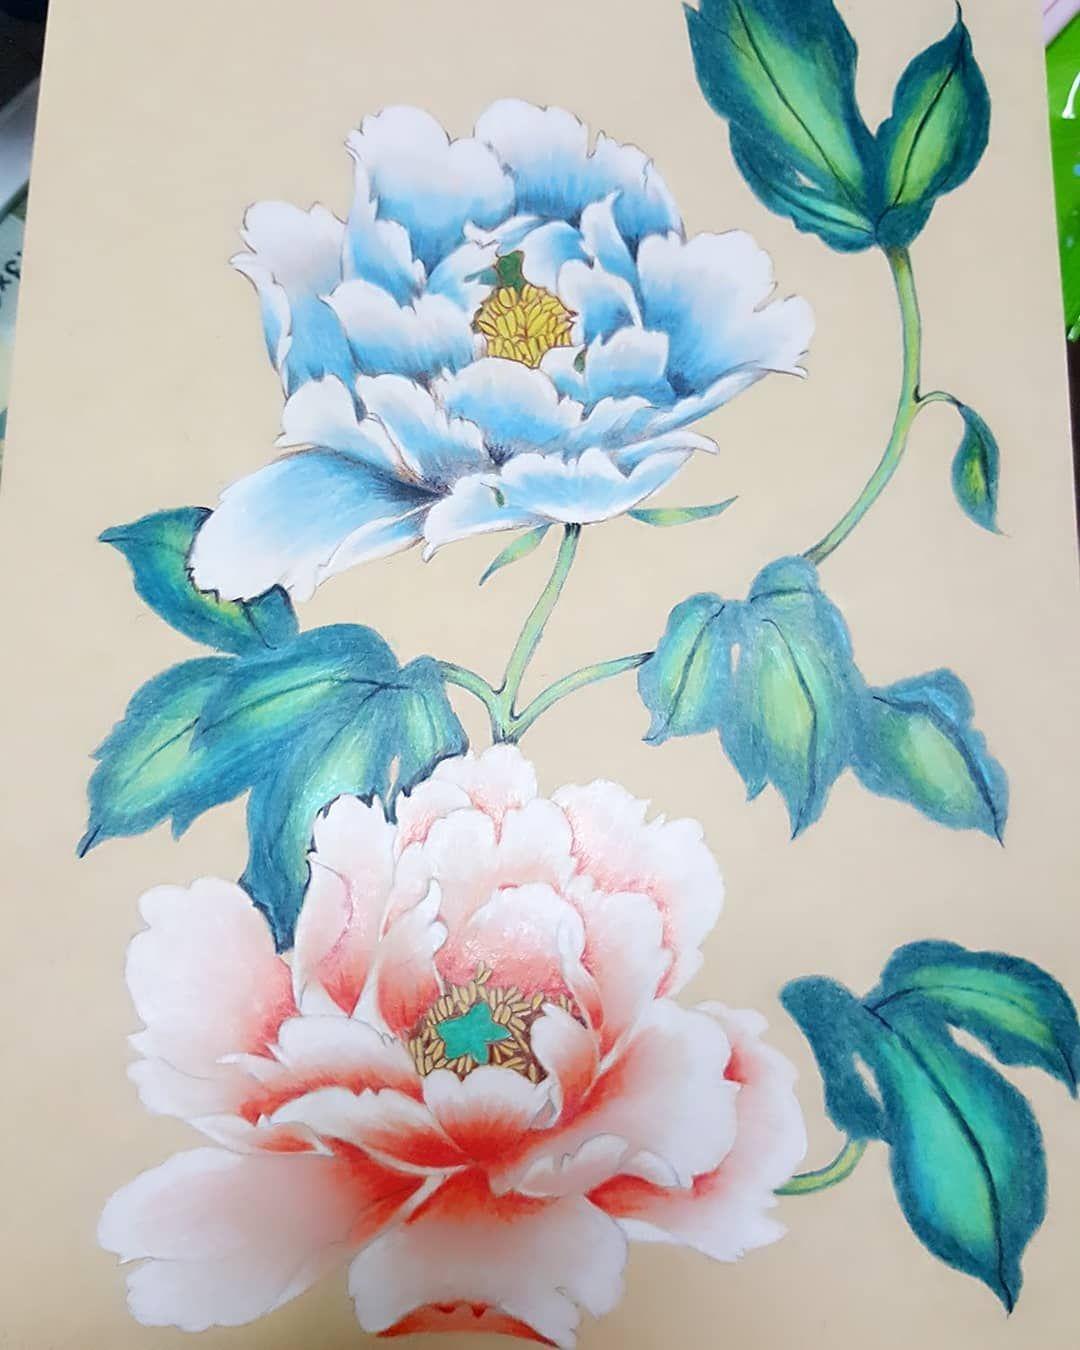 instagram 上的 陳怡靜 第一次色鉛筆畫作品 牡丹花2 牡丹 花 花 絵